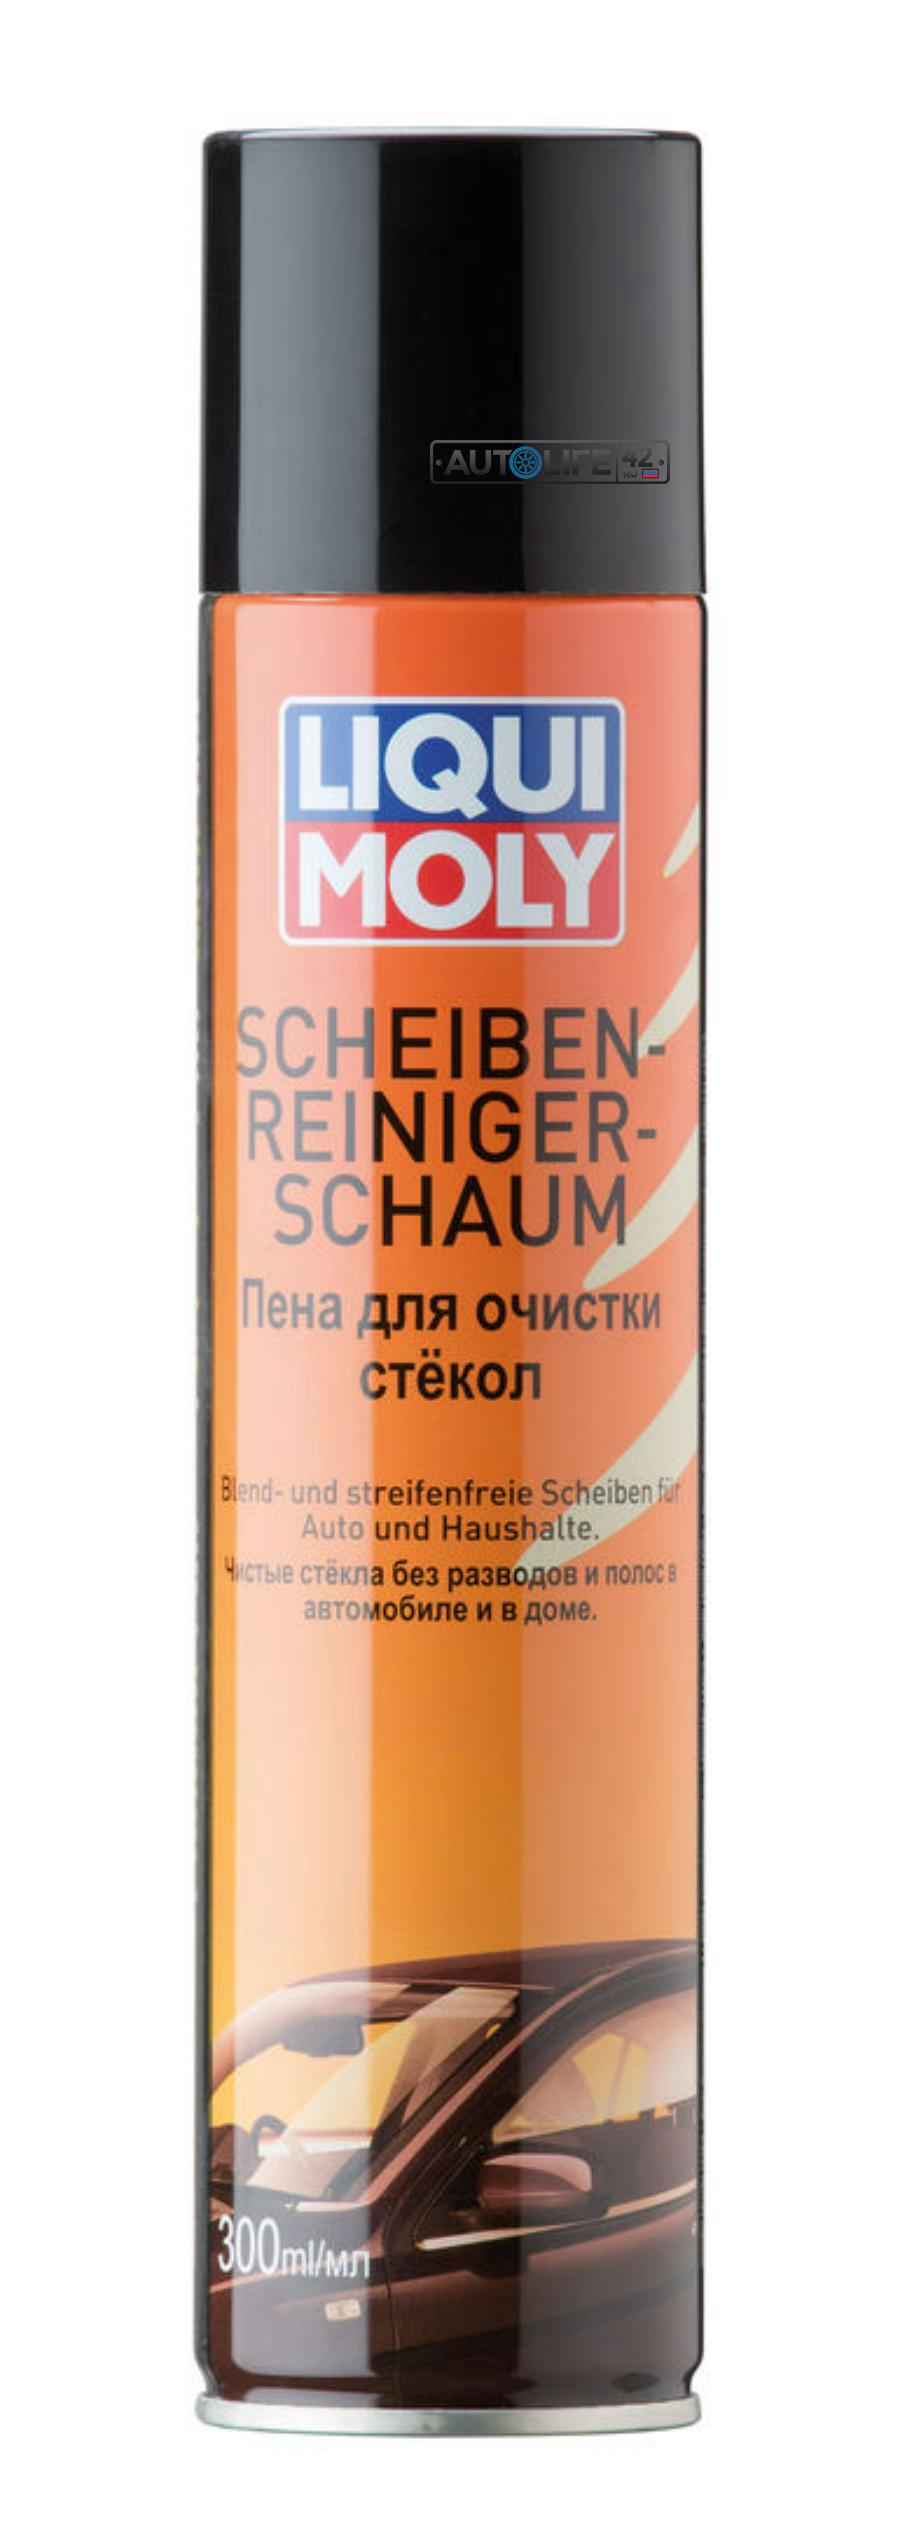 Пена для очистки стекол Scheiben-Reiniger-Schaum